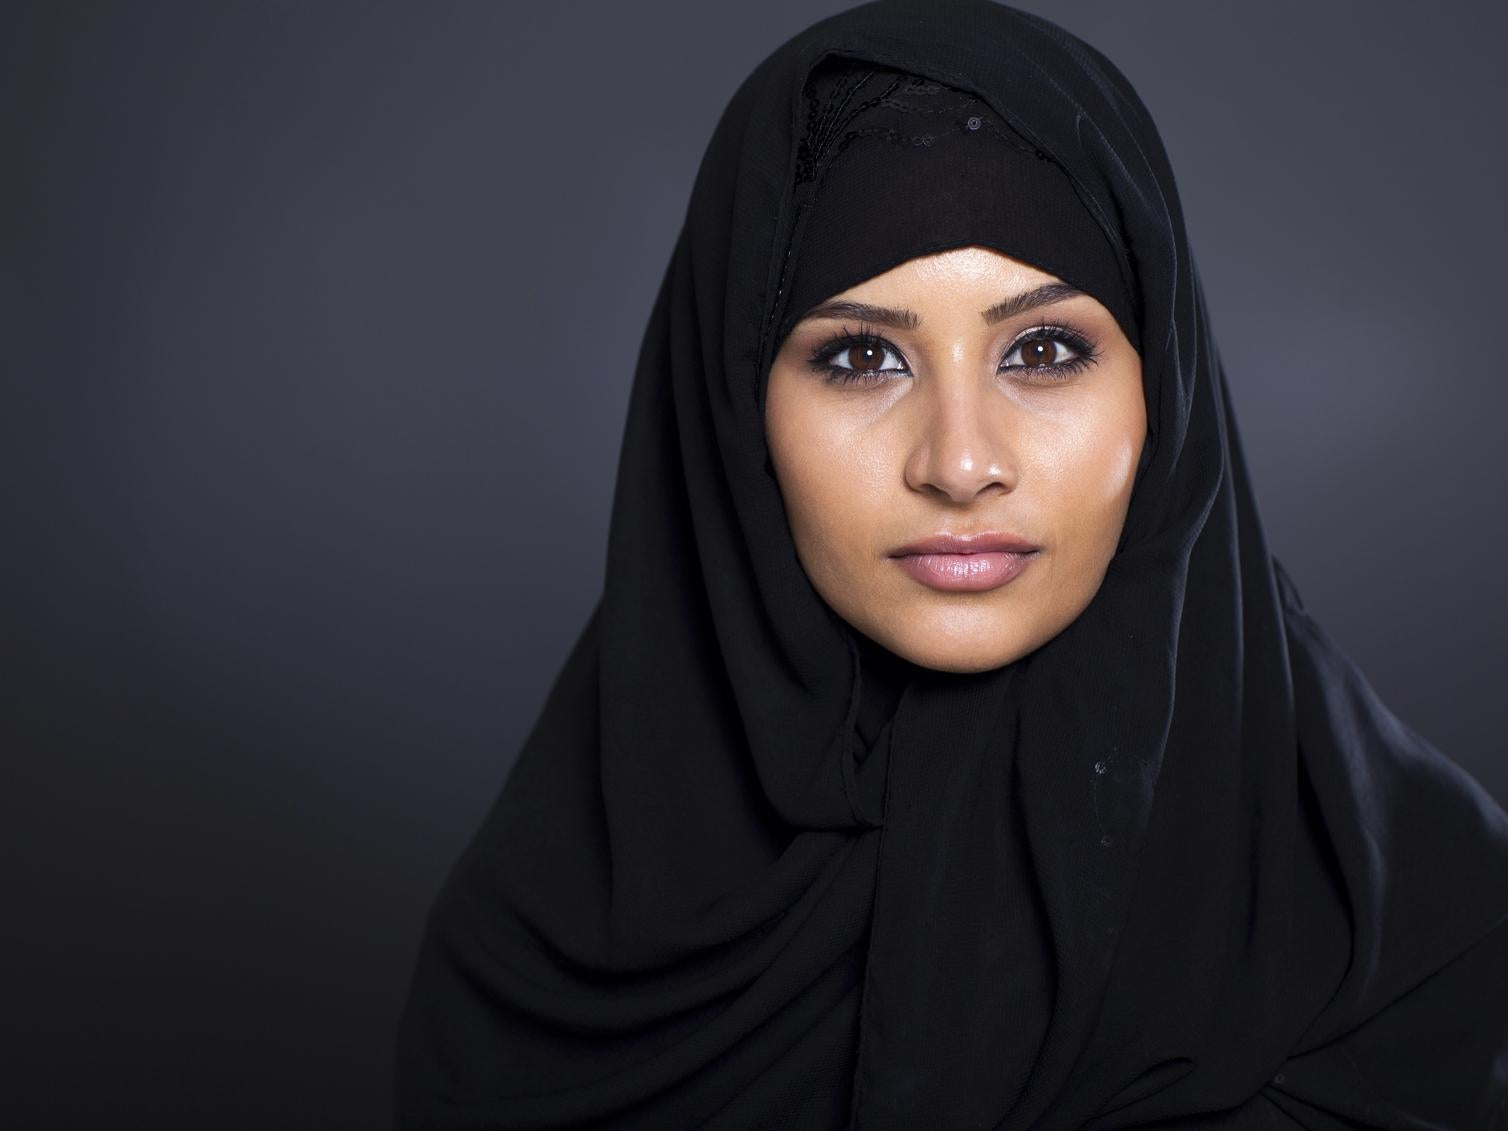 Islamic women burka dating profiles funny pics